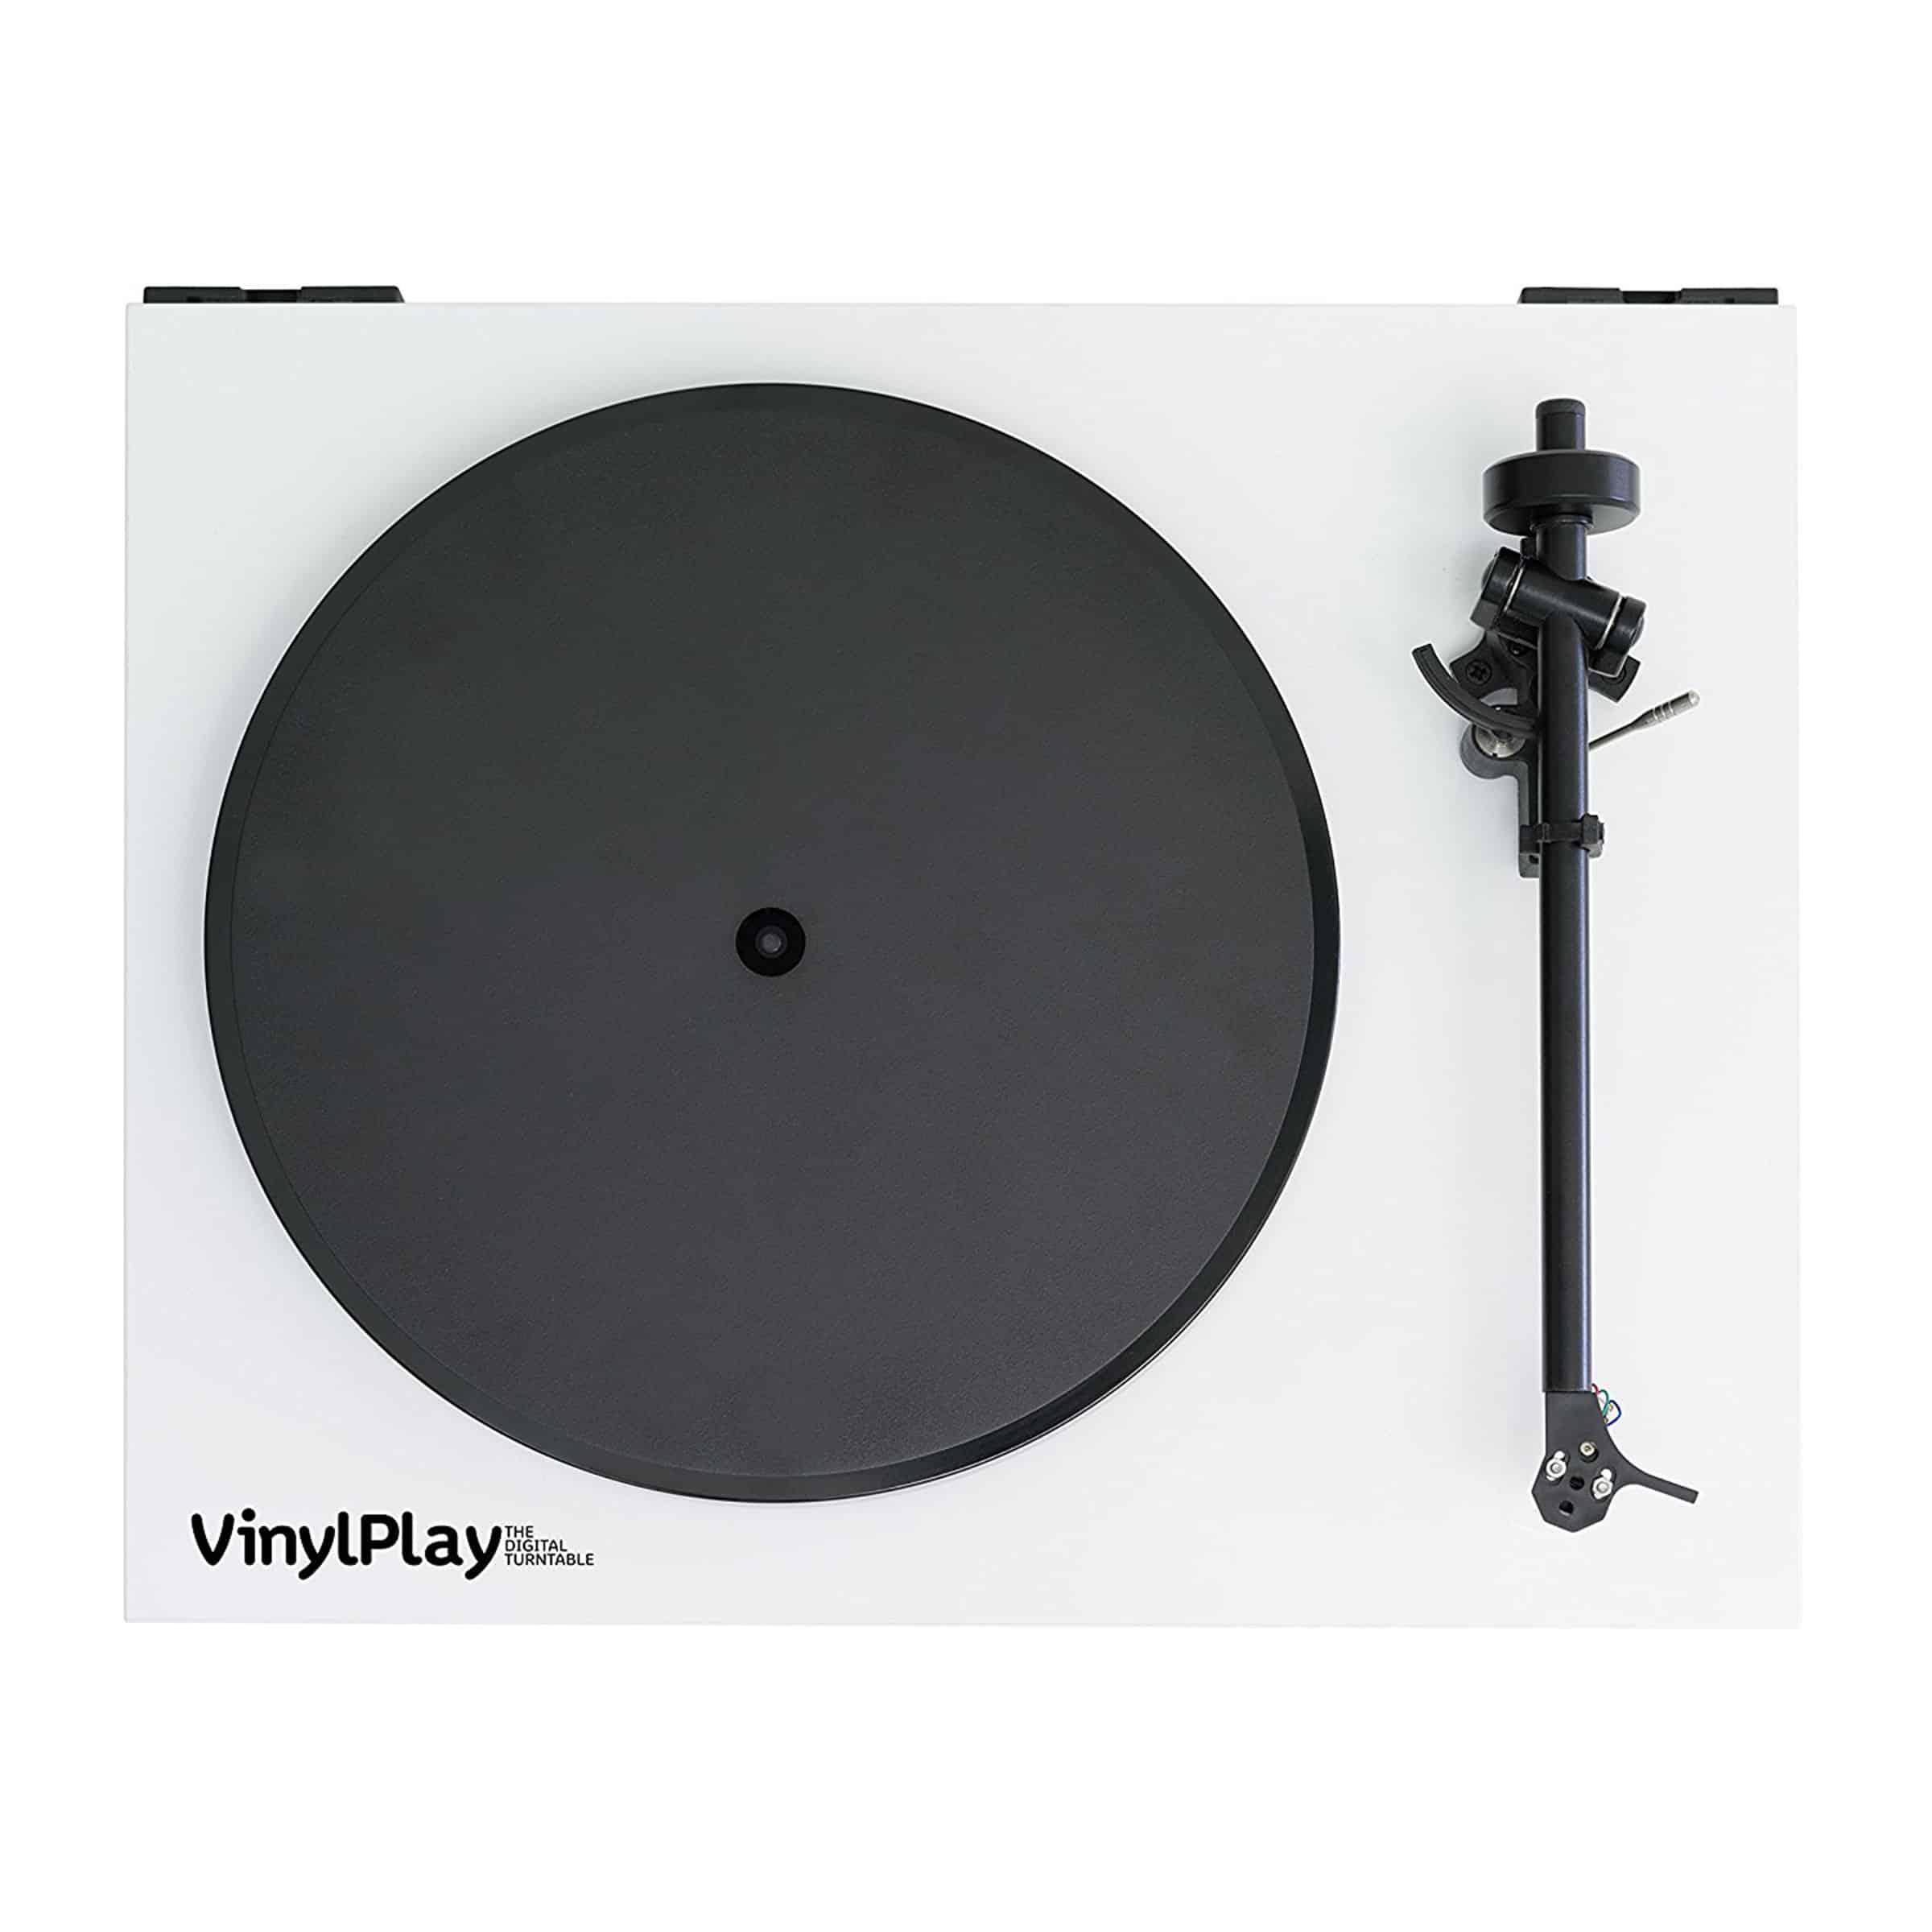 Sonos Platenspeler vinylplay wit 6